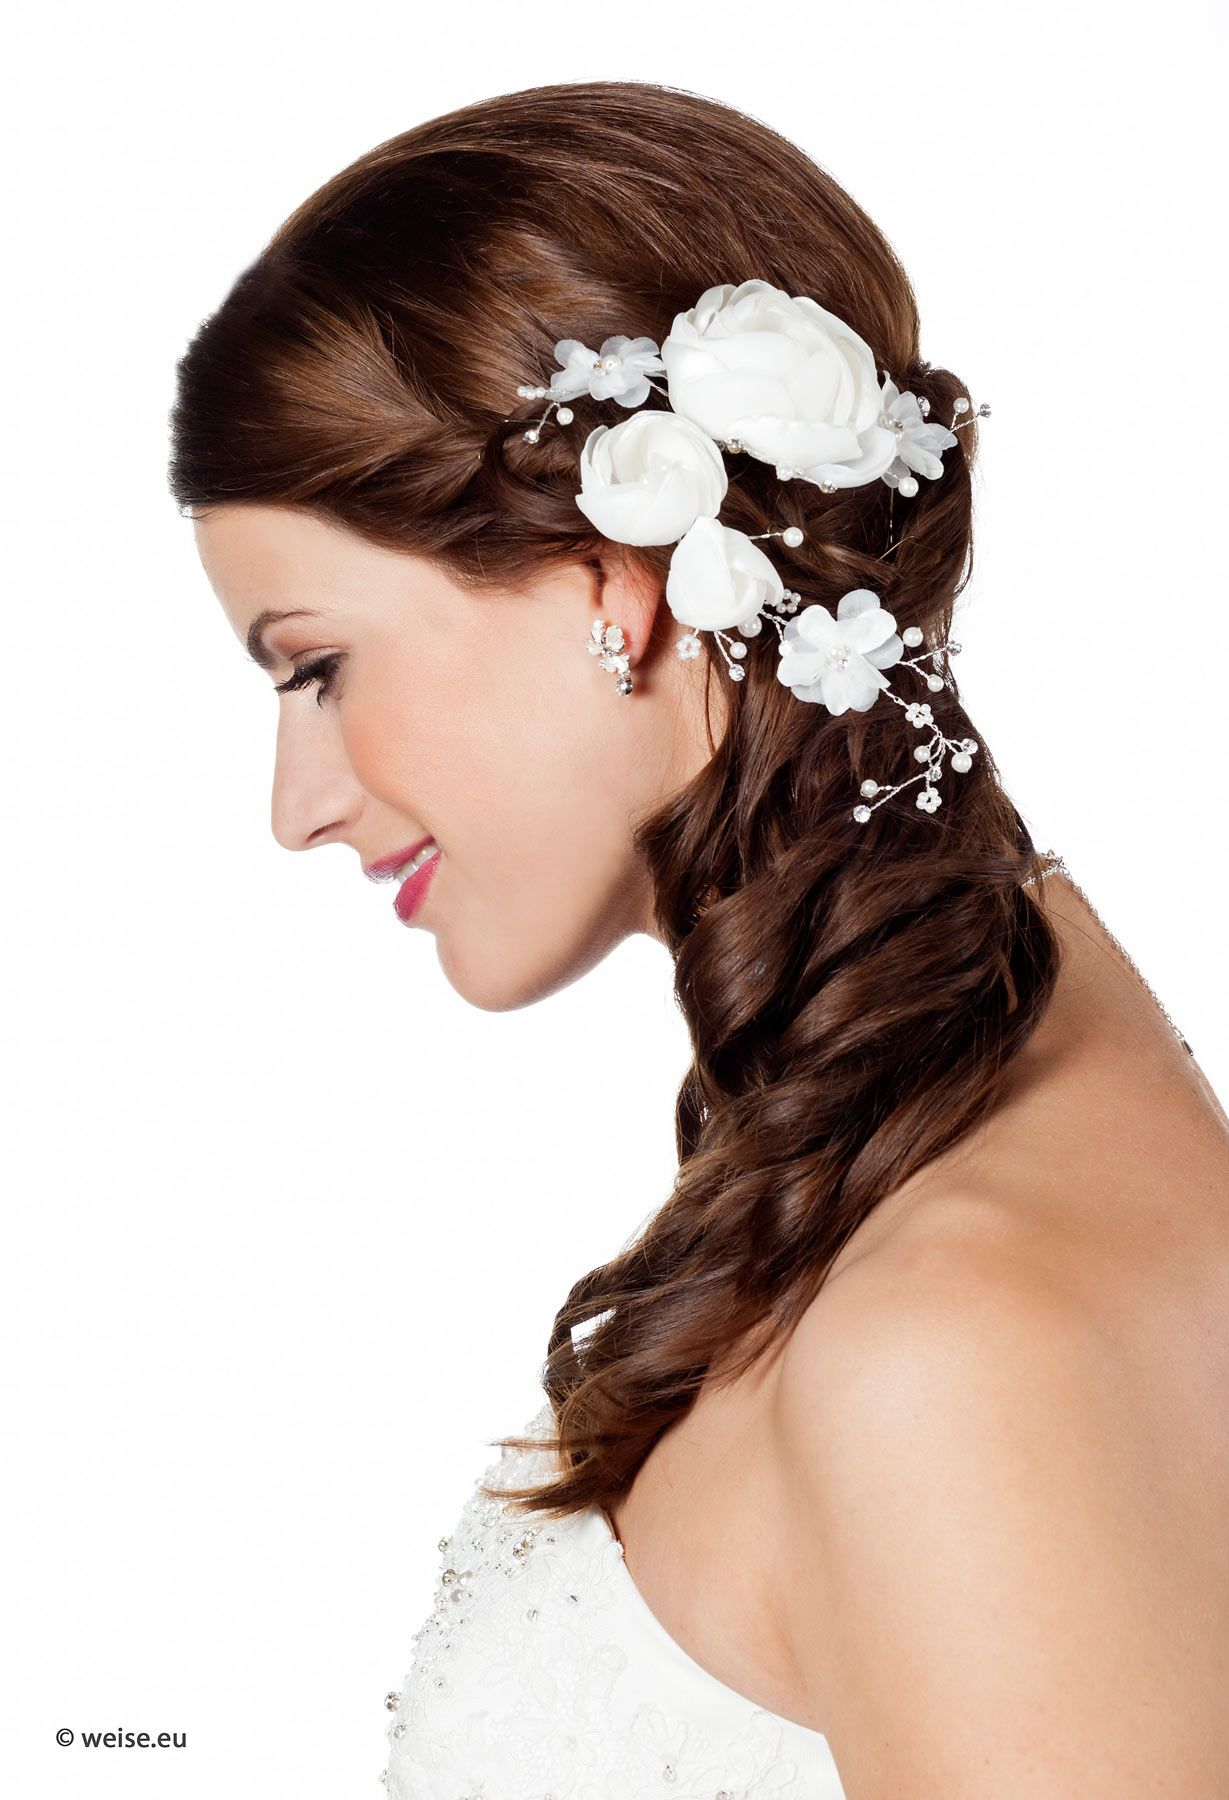 Ausgefallene Asymmetrische Frisur Curled Wedding Hair Cute Wedding Hairstyles Bridal Hair